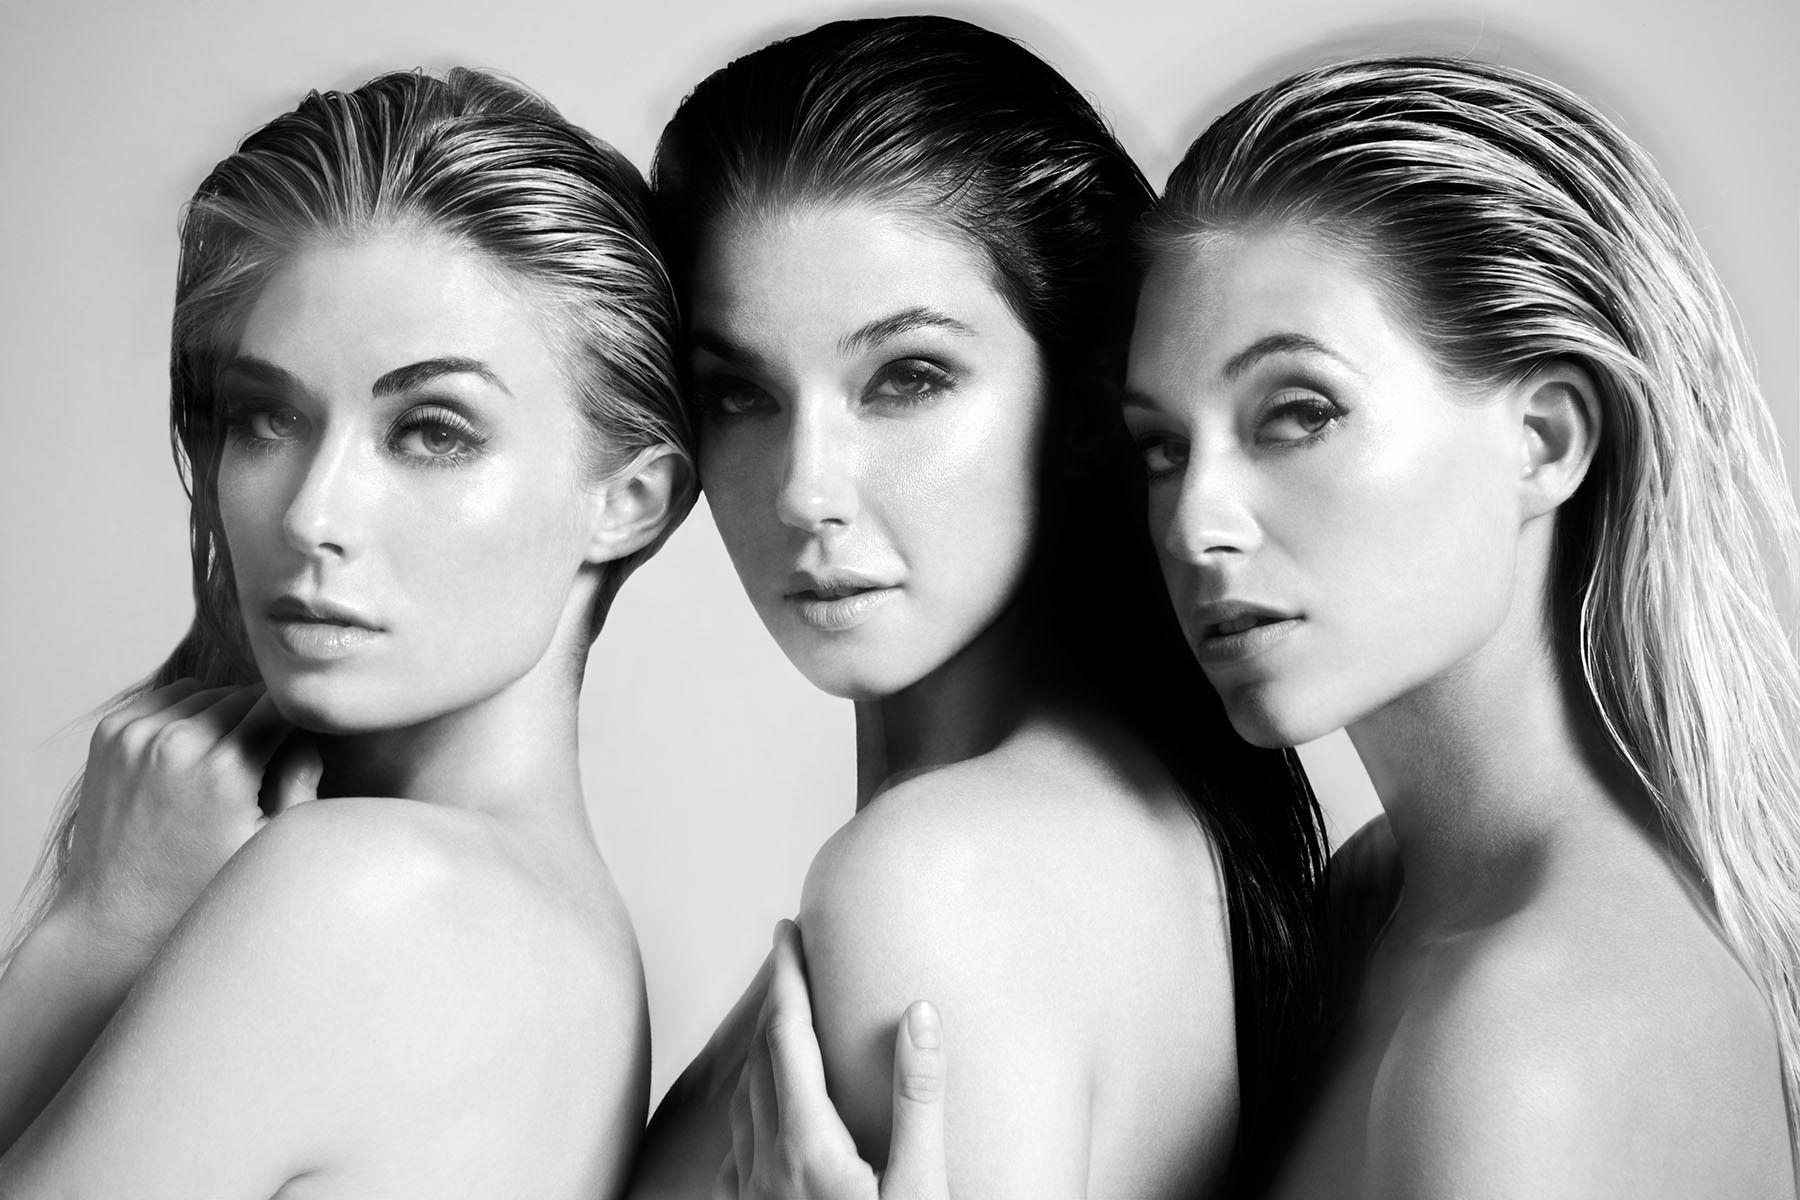 Models: Jill Murphy, Dani Smith